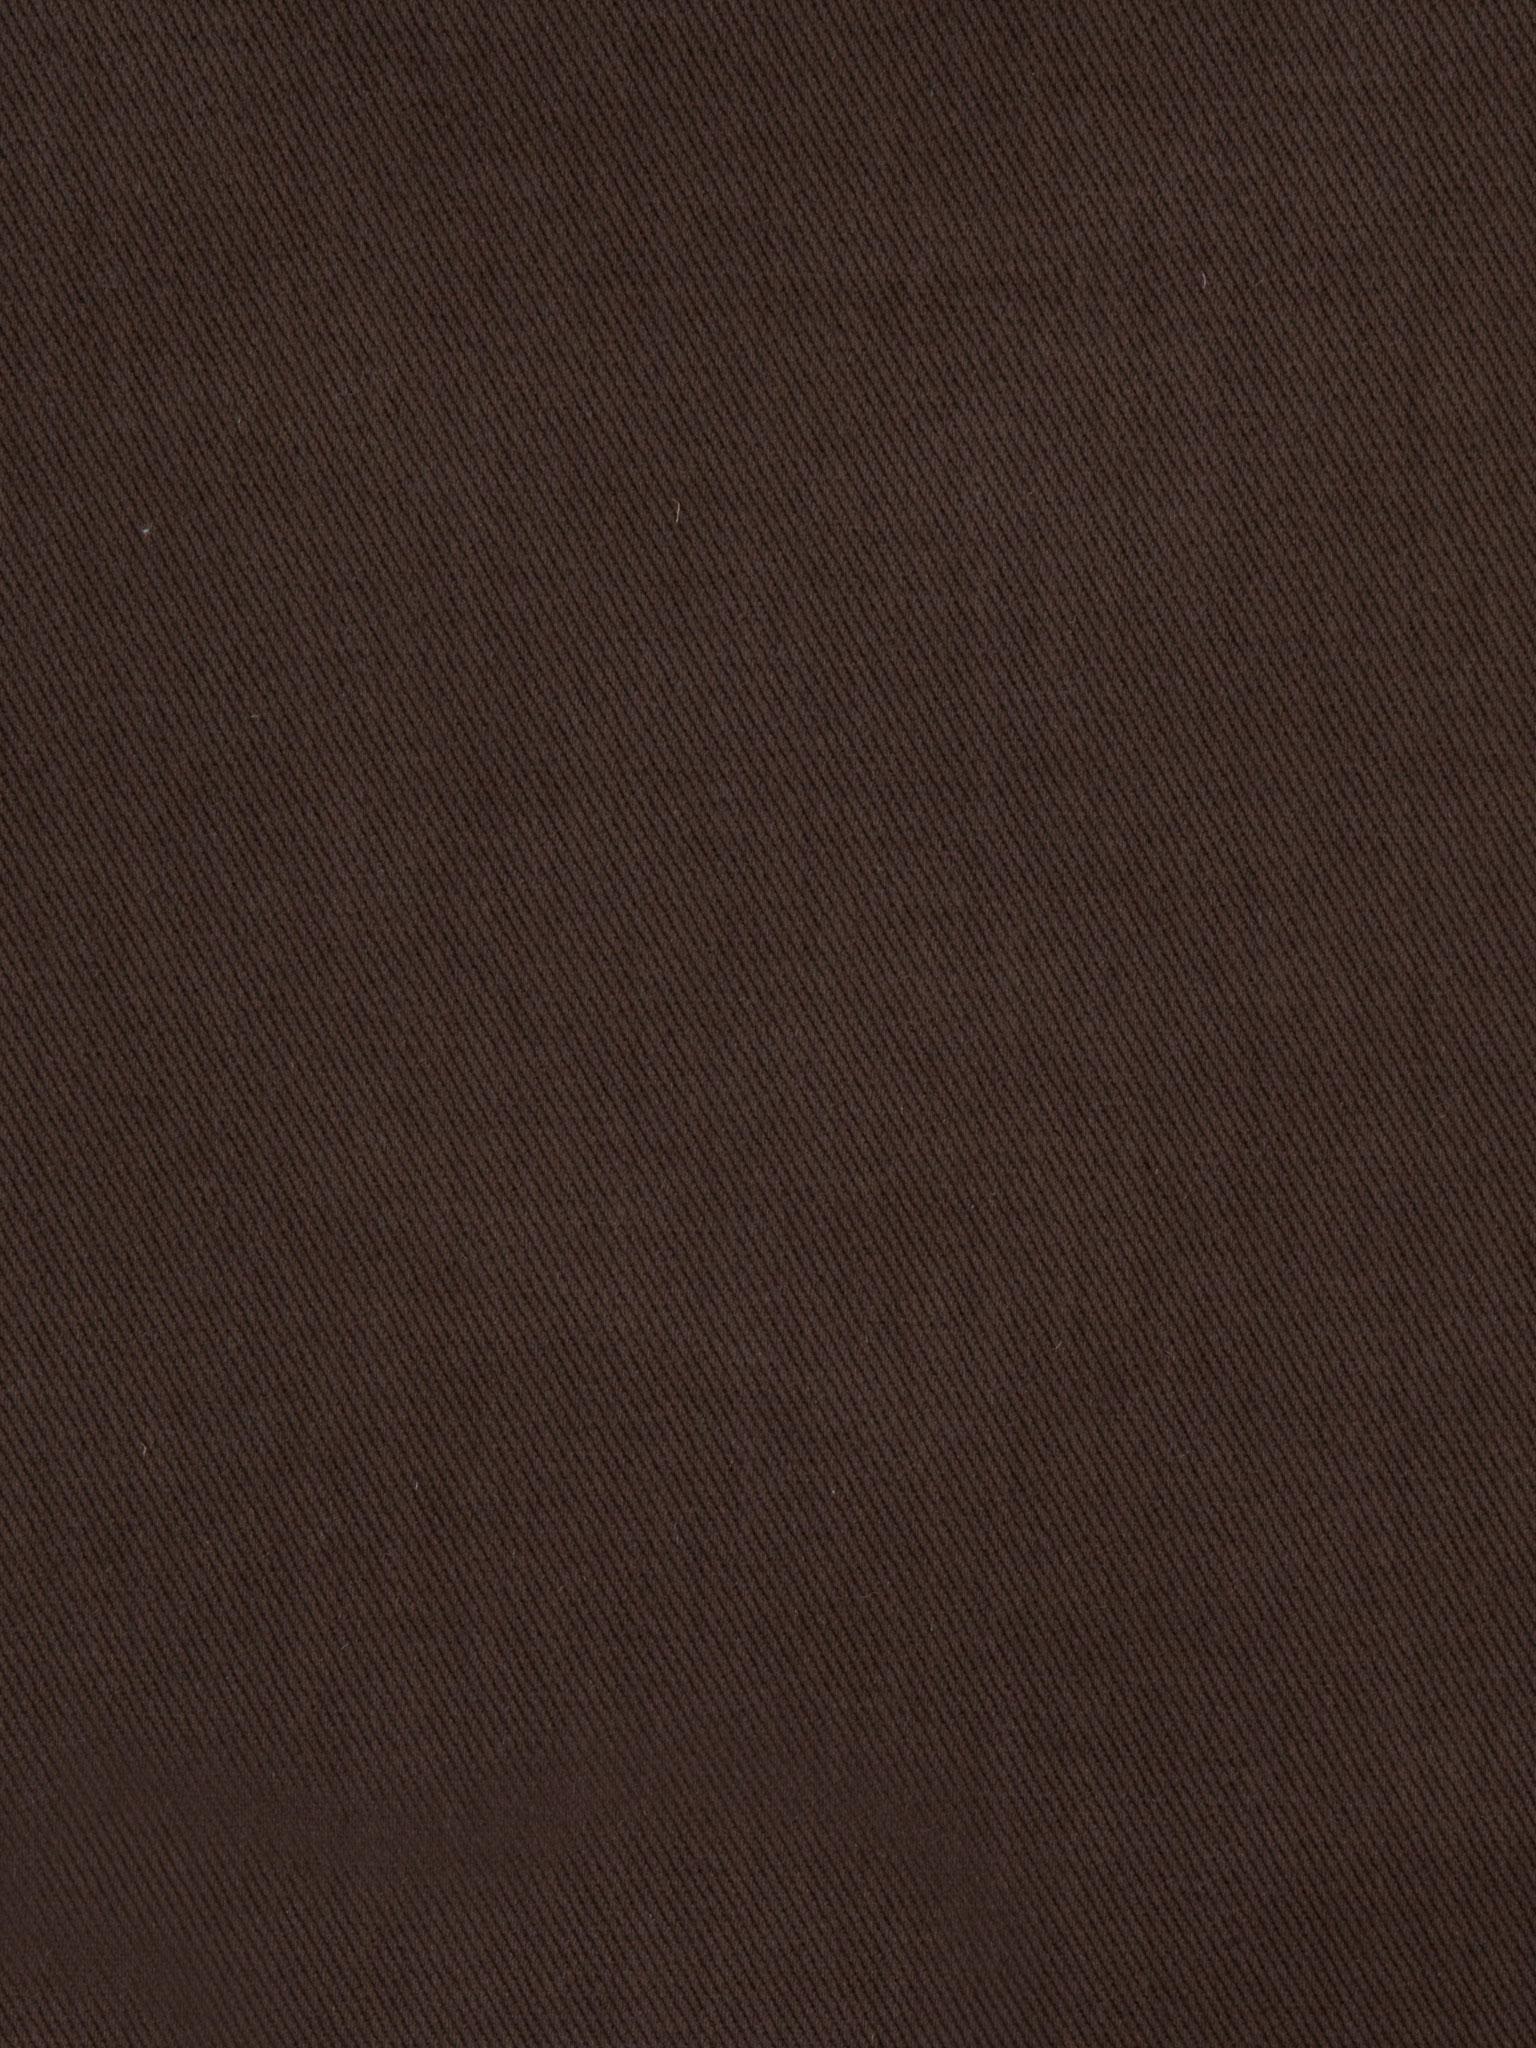 DELACROIX 161304